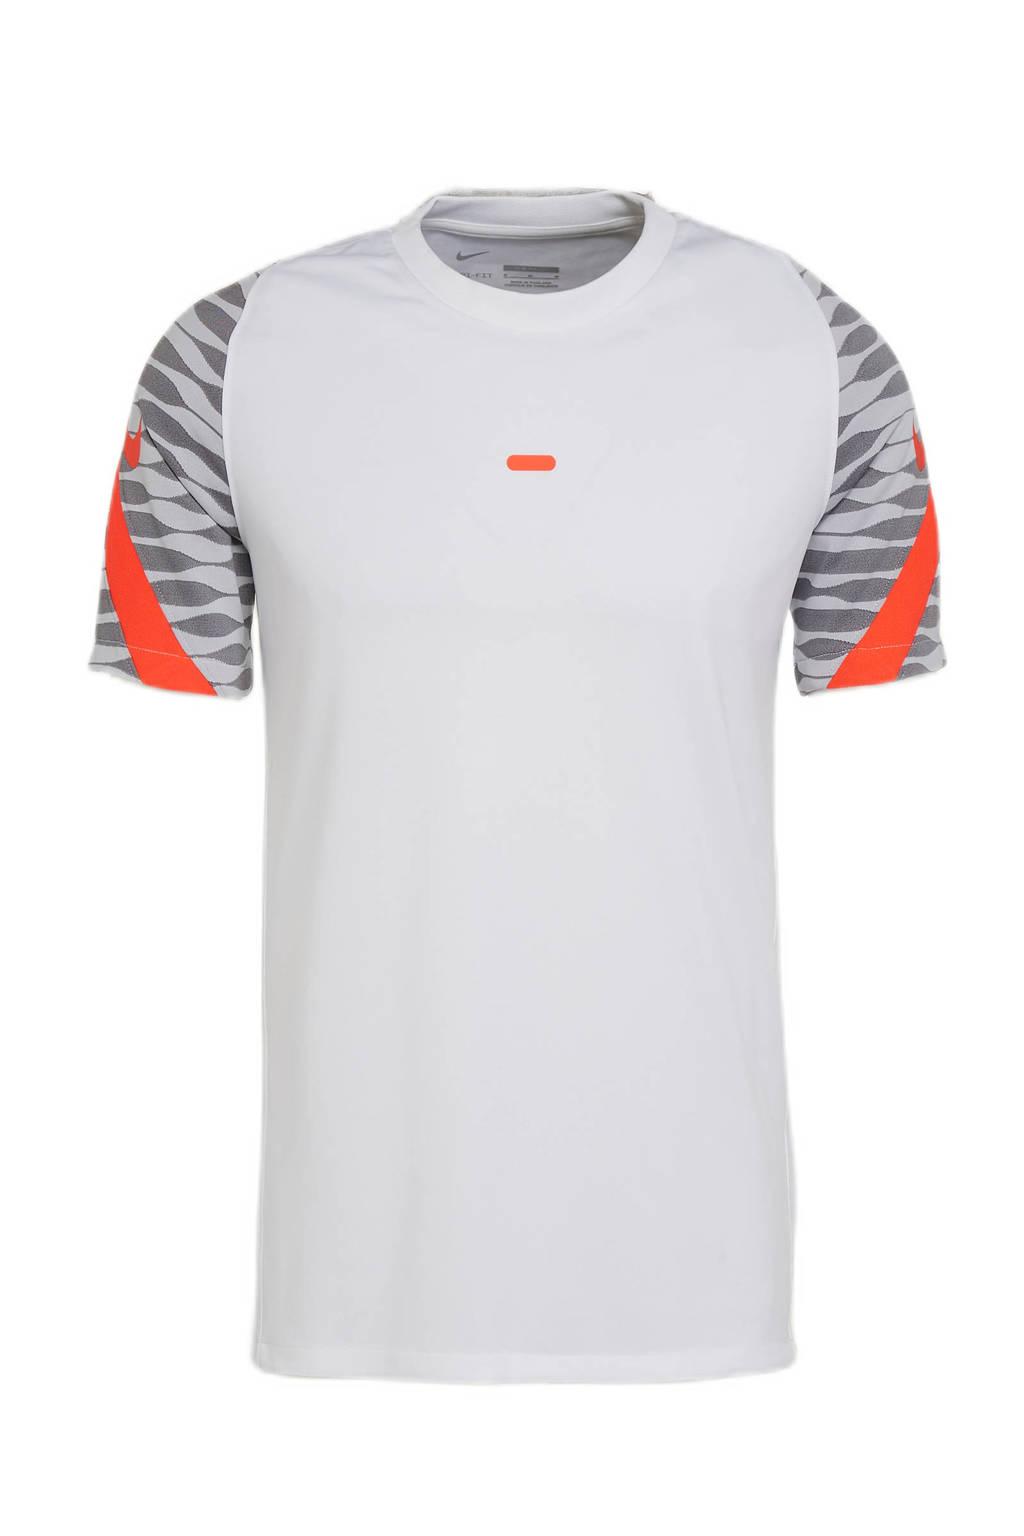 Nike Senior  voetbalshirt wit/grijs, Wit/grijs